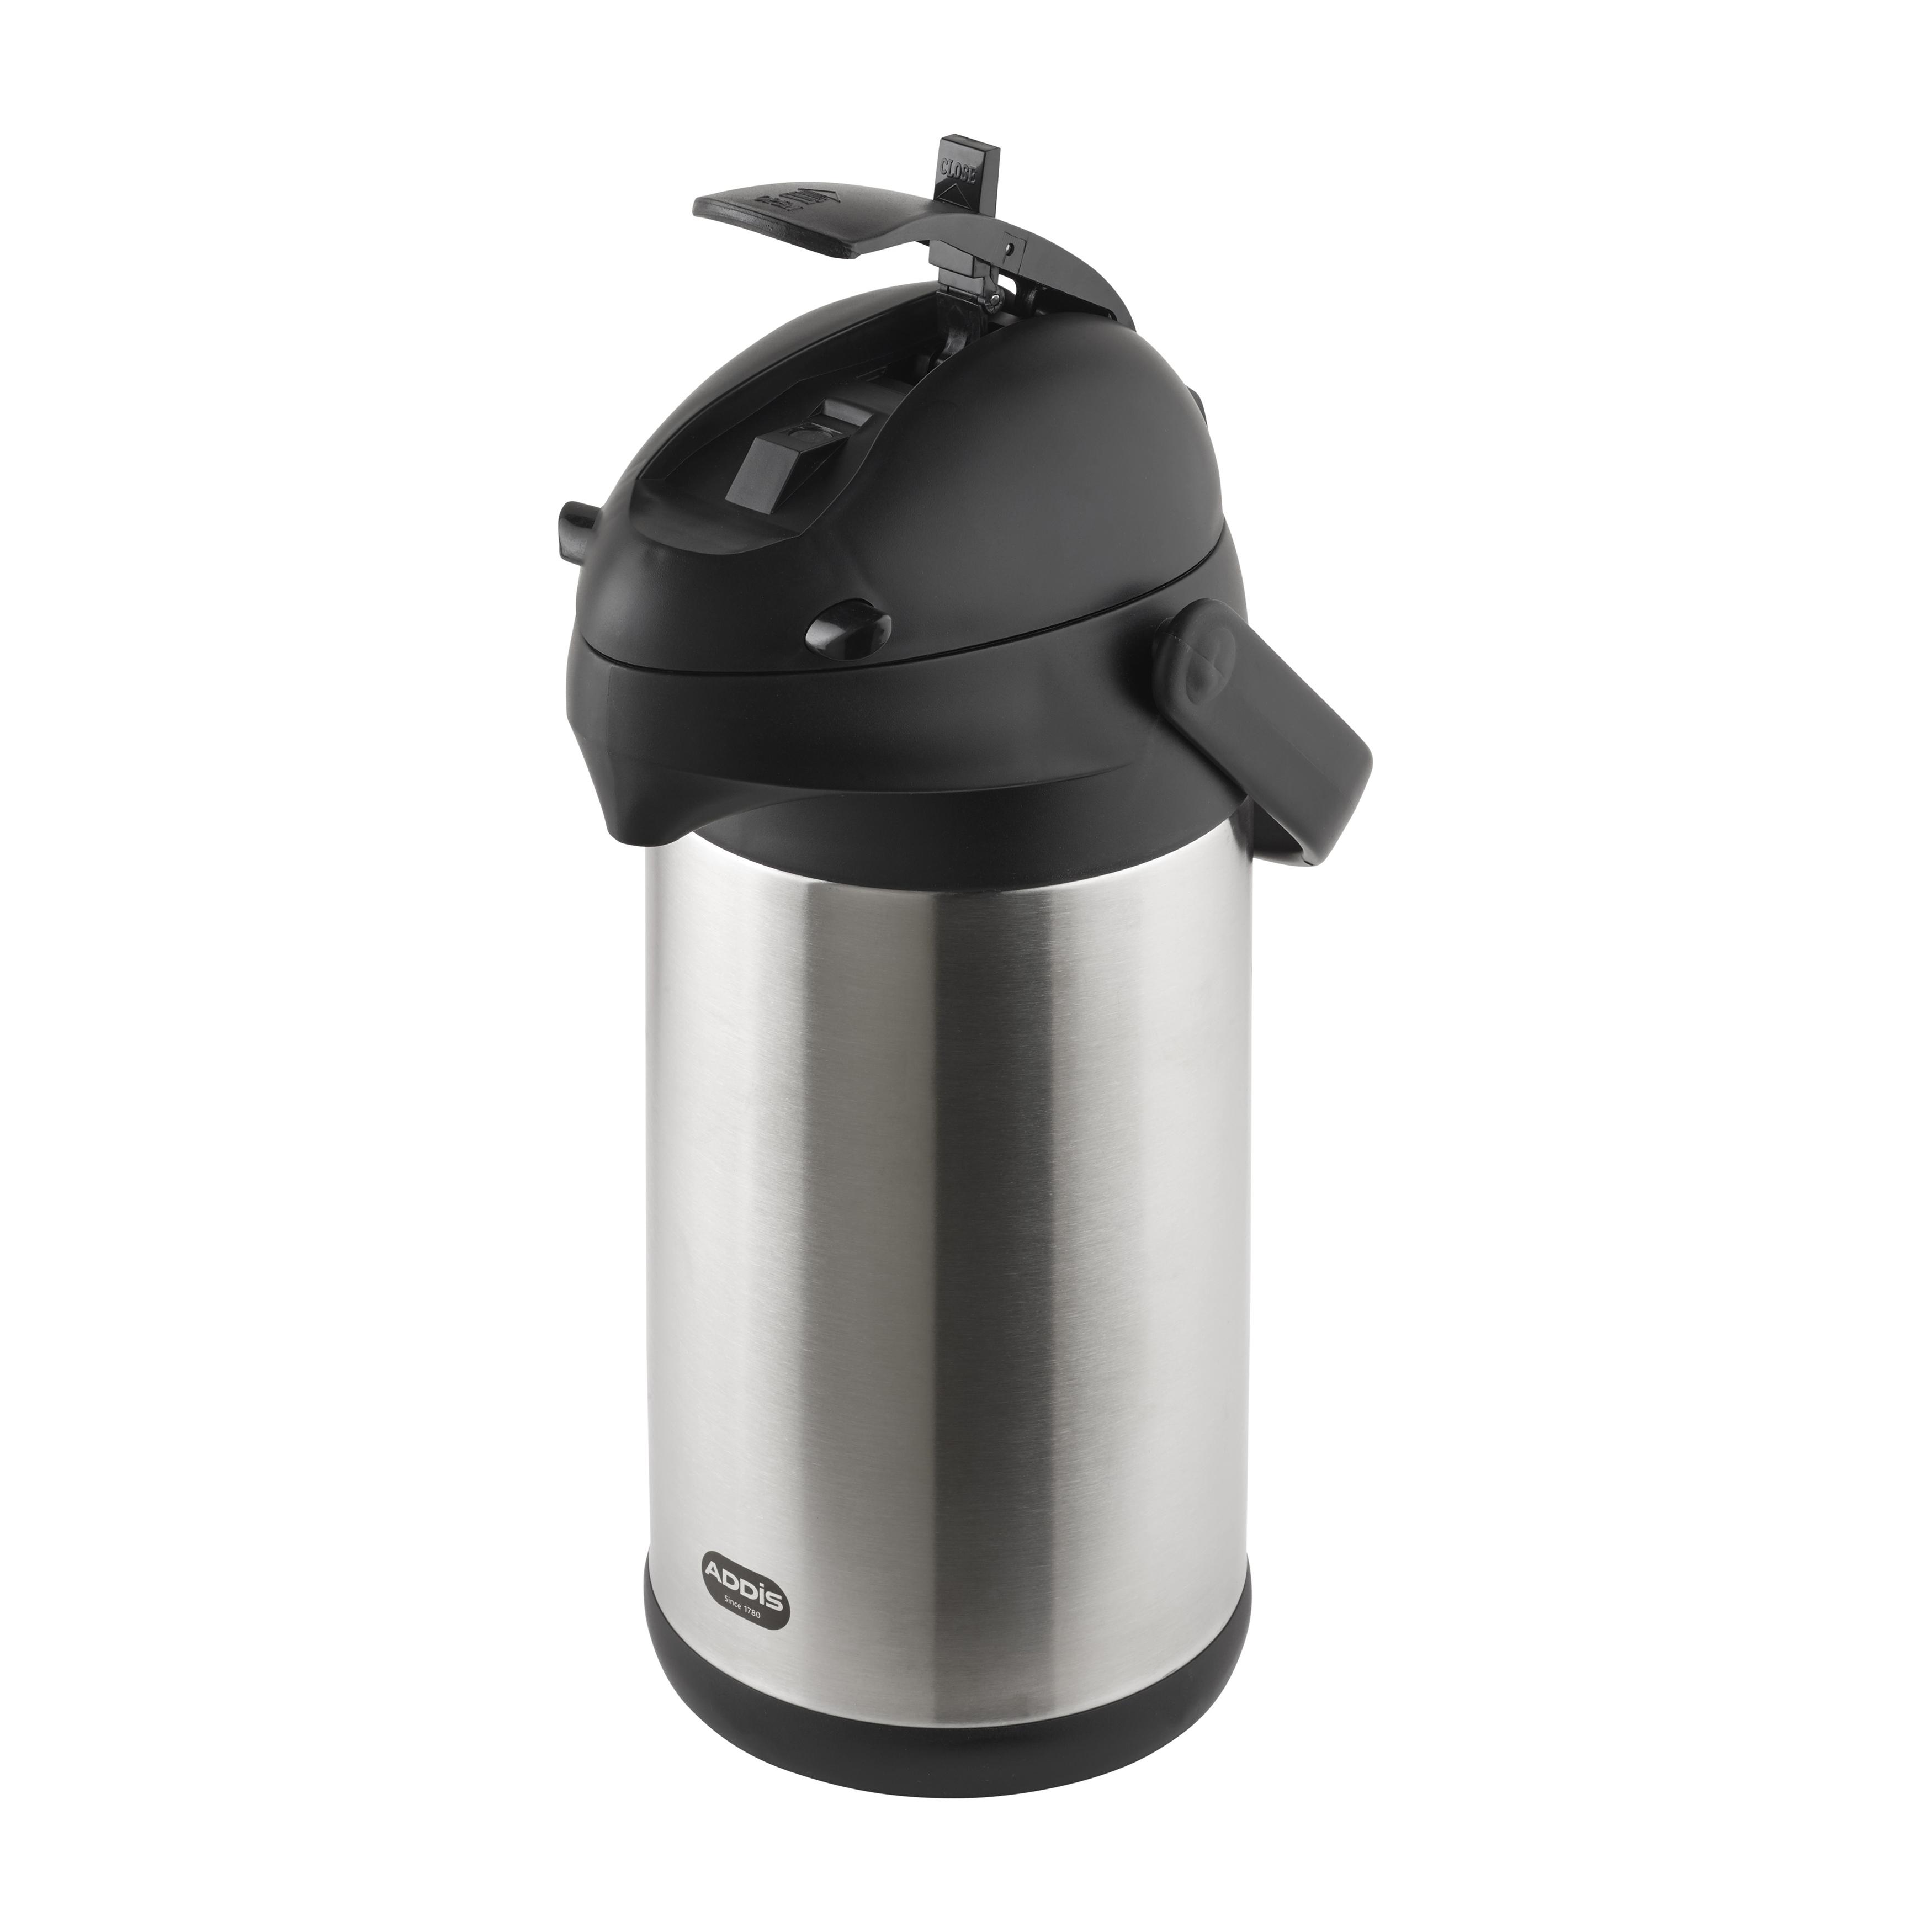 Addis Pump Pot Vacuum Jug 8 Hour Heat Retainer 3 Litre Capacity Stainless Steel Ref 517465